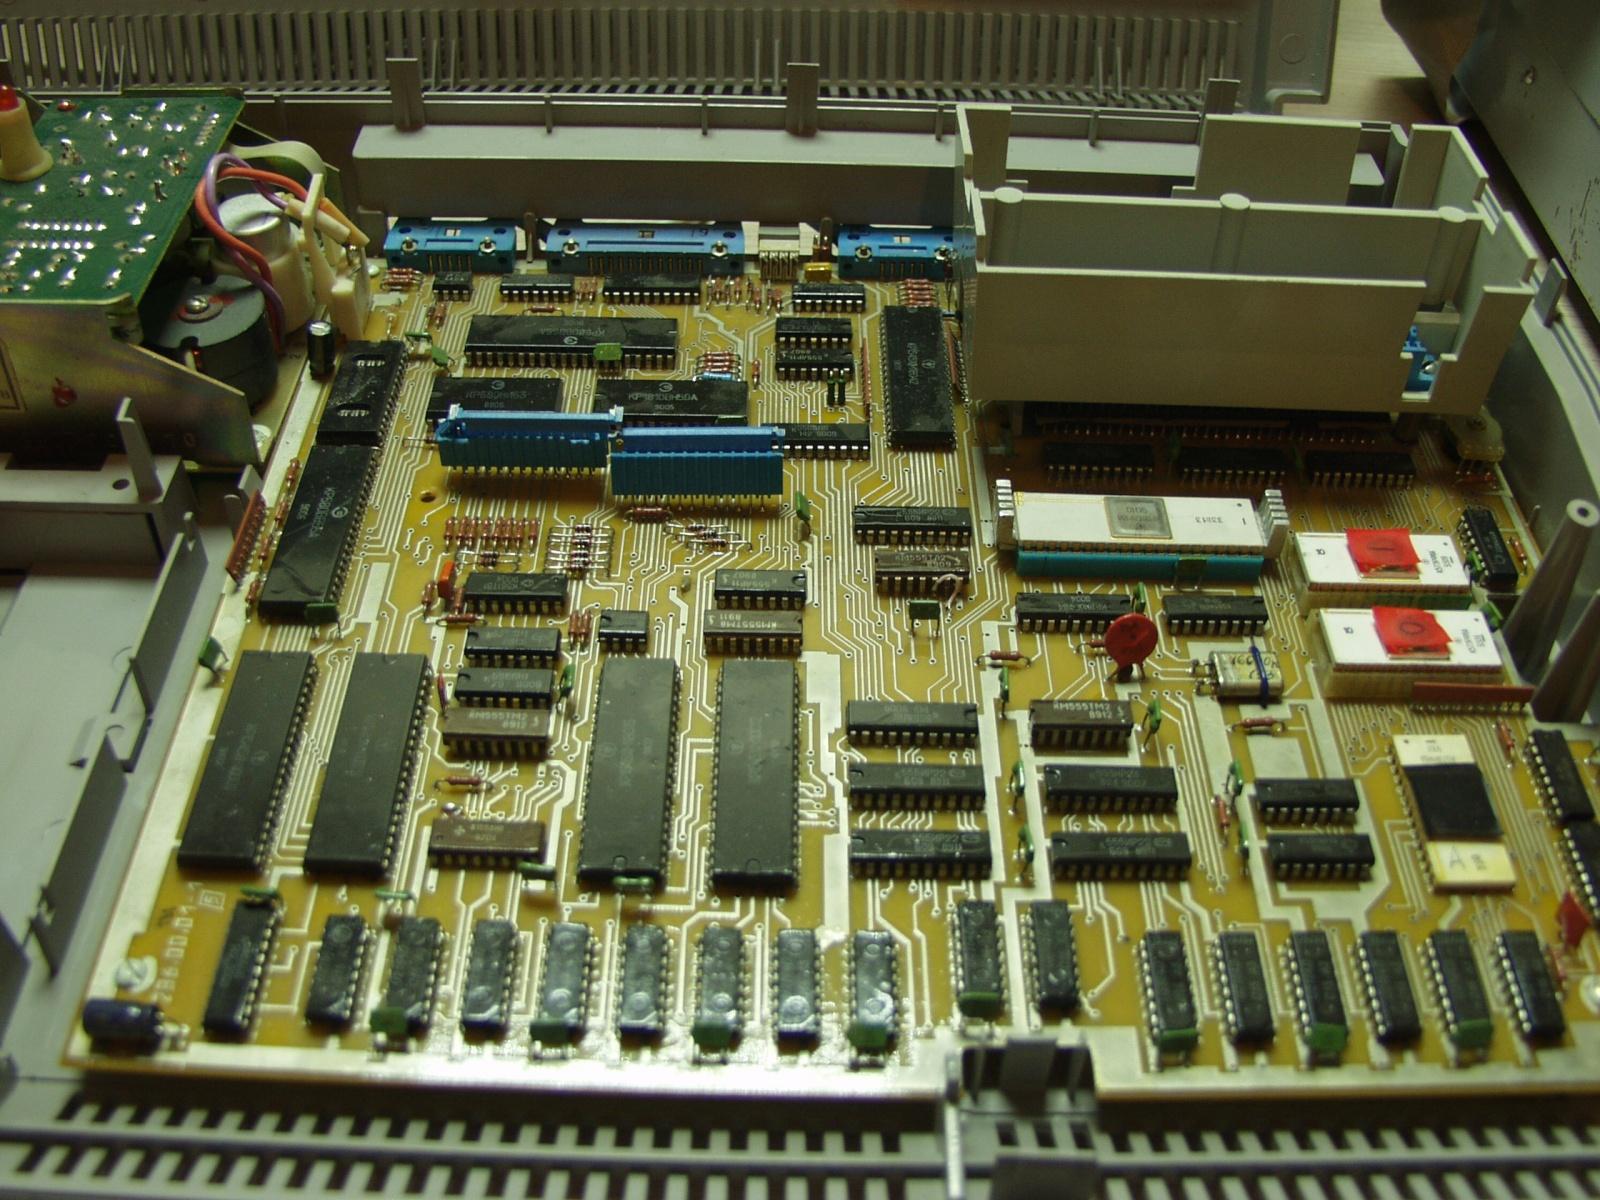 Советская IBM-PC Электроника МС-1502 - 5